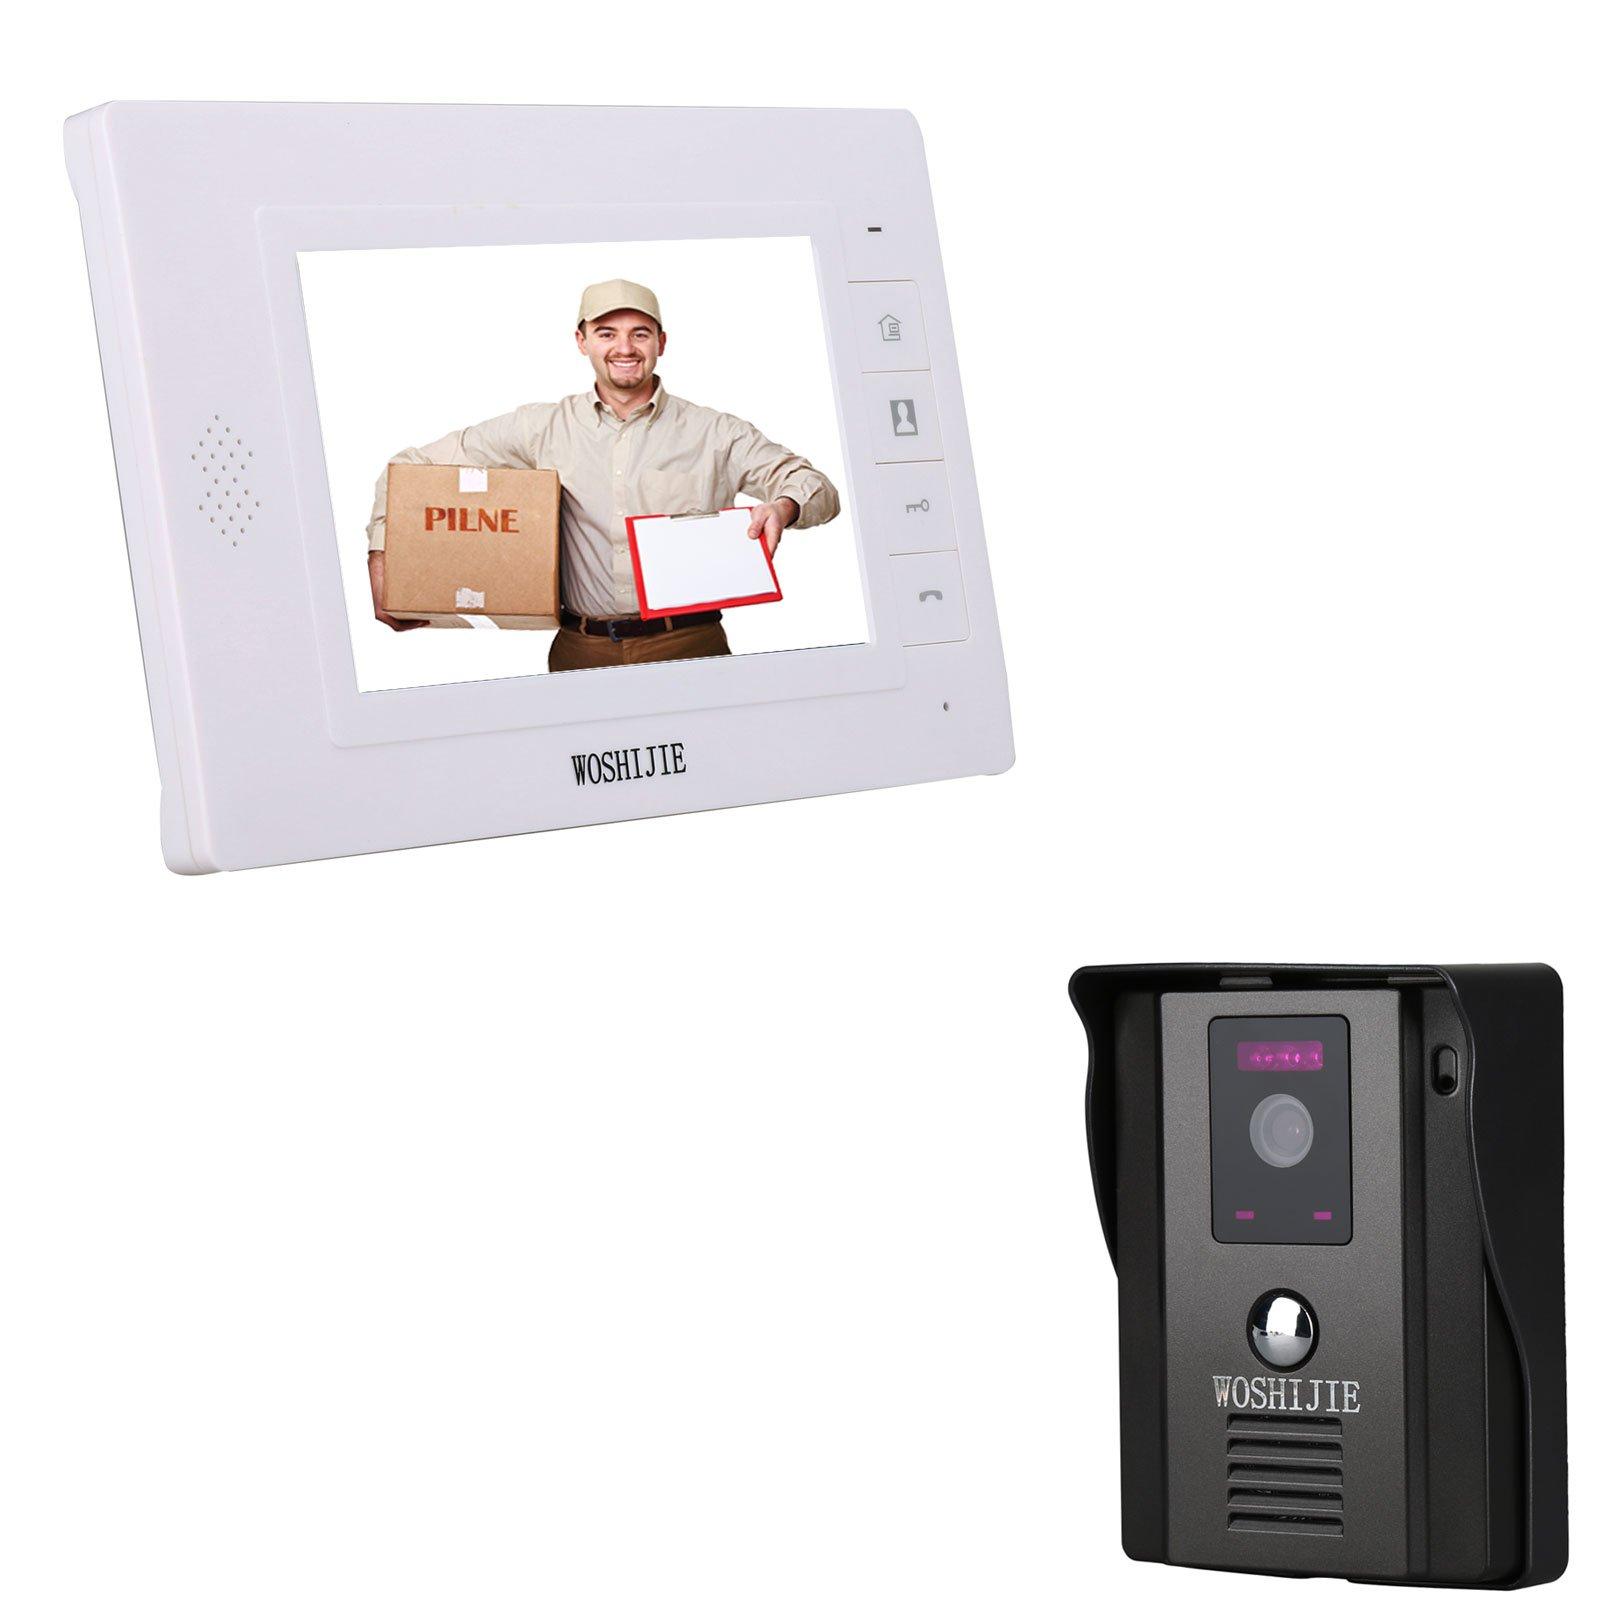 7''Wired Video Doorbell Phone,WOSHIJIE Rainproof Intercom Monitor Video Doorphone System,IR Night Vision 600TVL HD Camera kits Support Unlock, Monitoring for Home Security(1 camera,1 monitor)